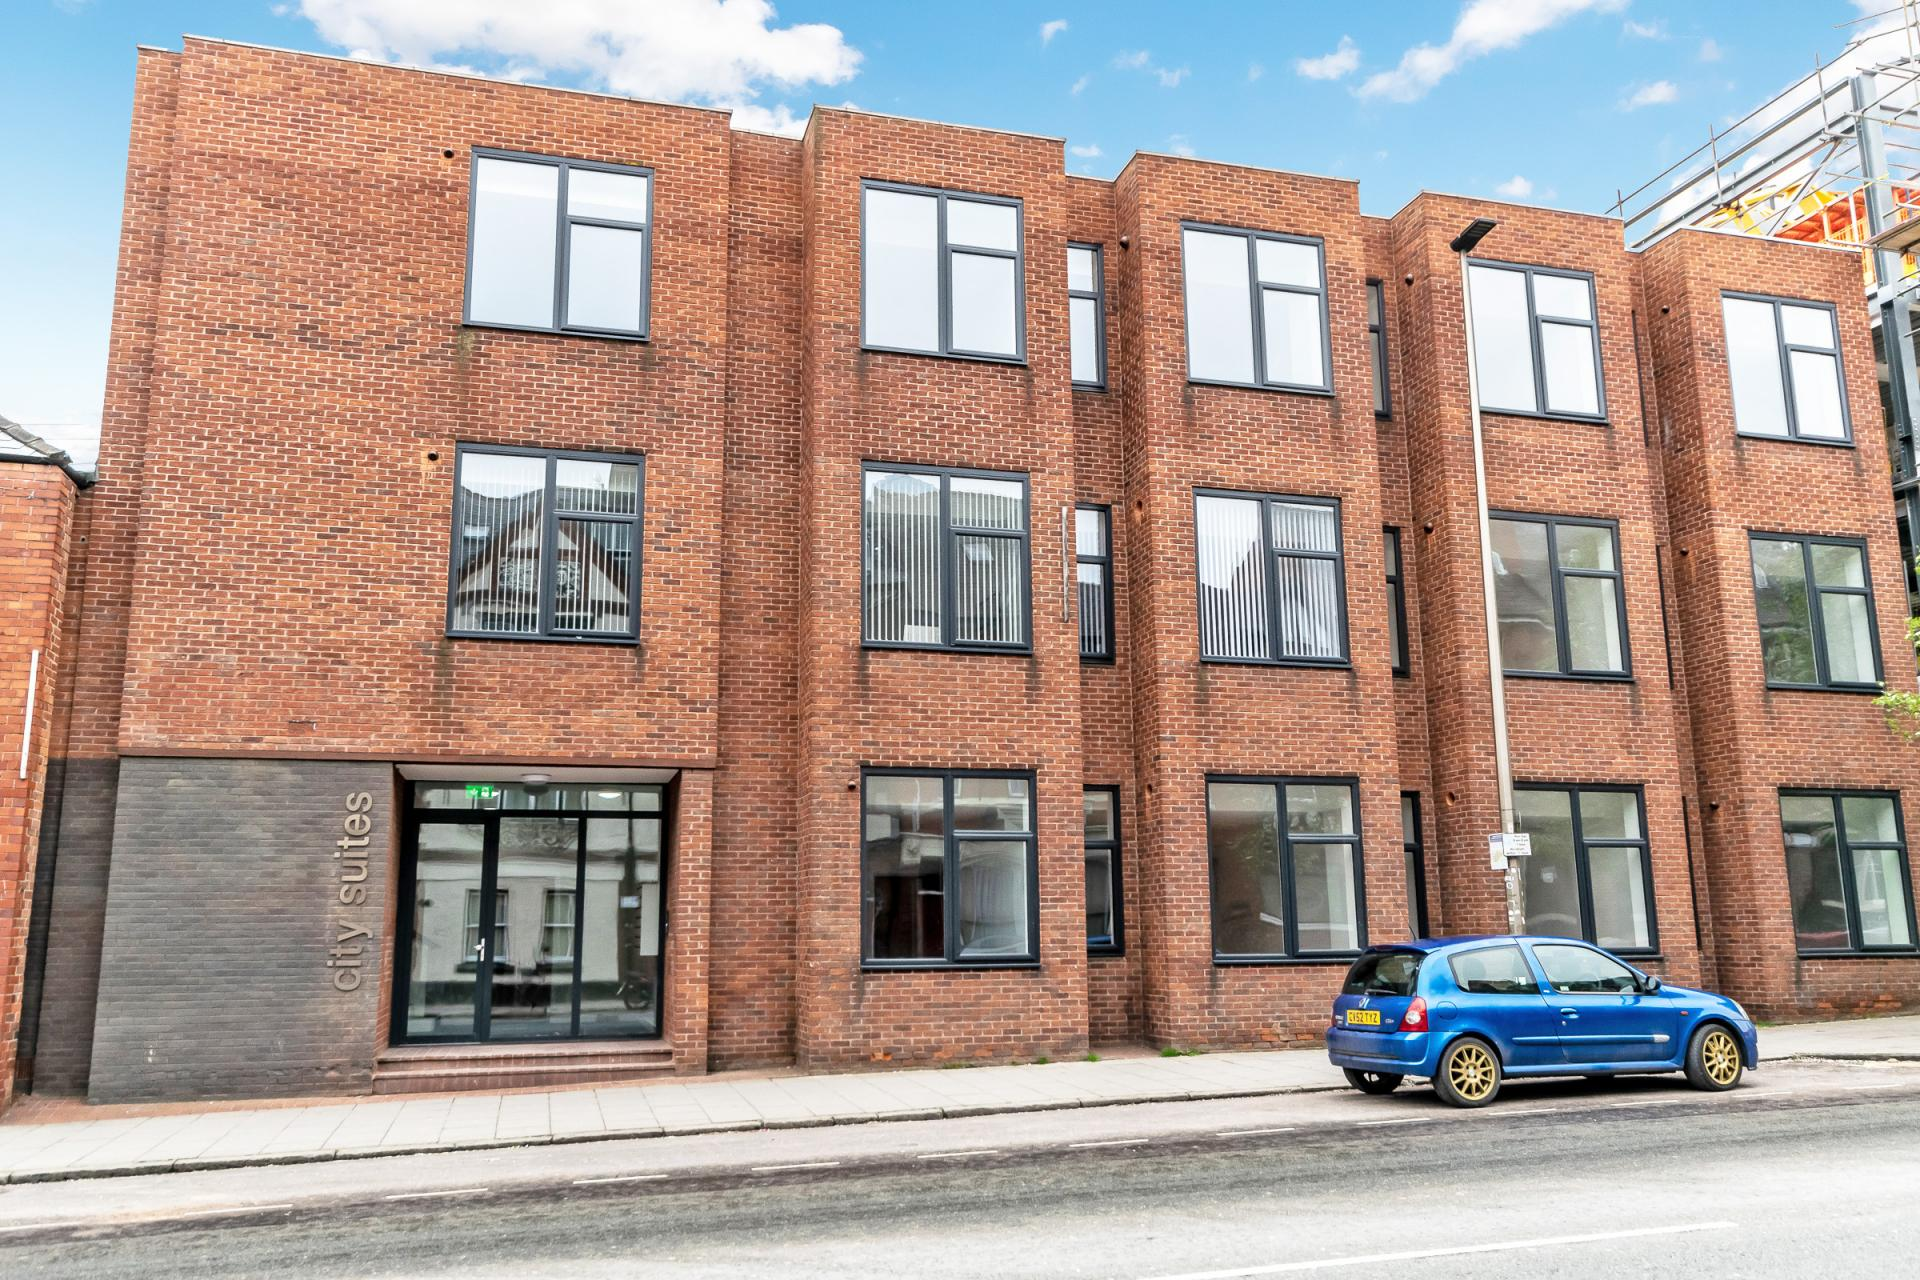 Building at City Suites Apartments